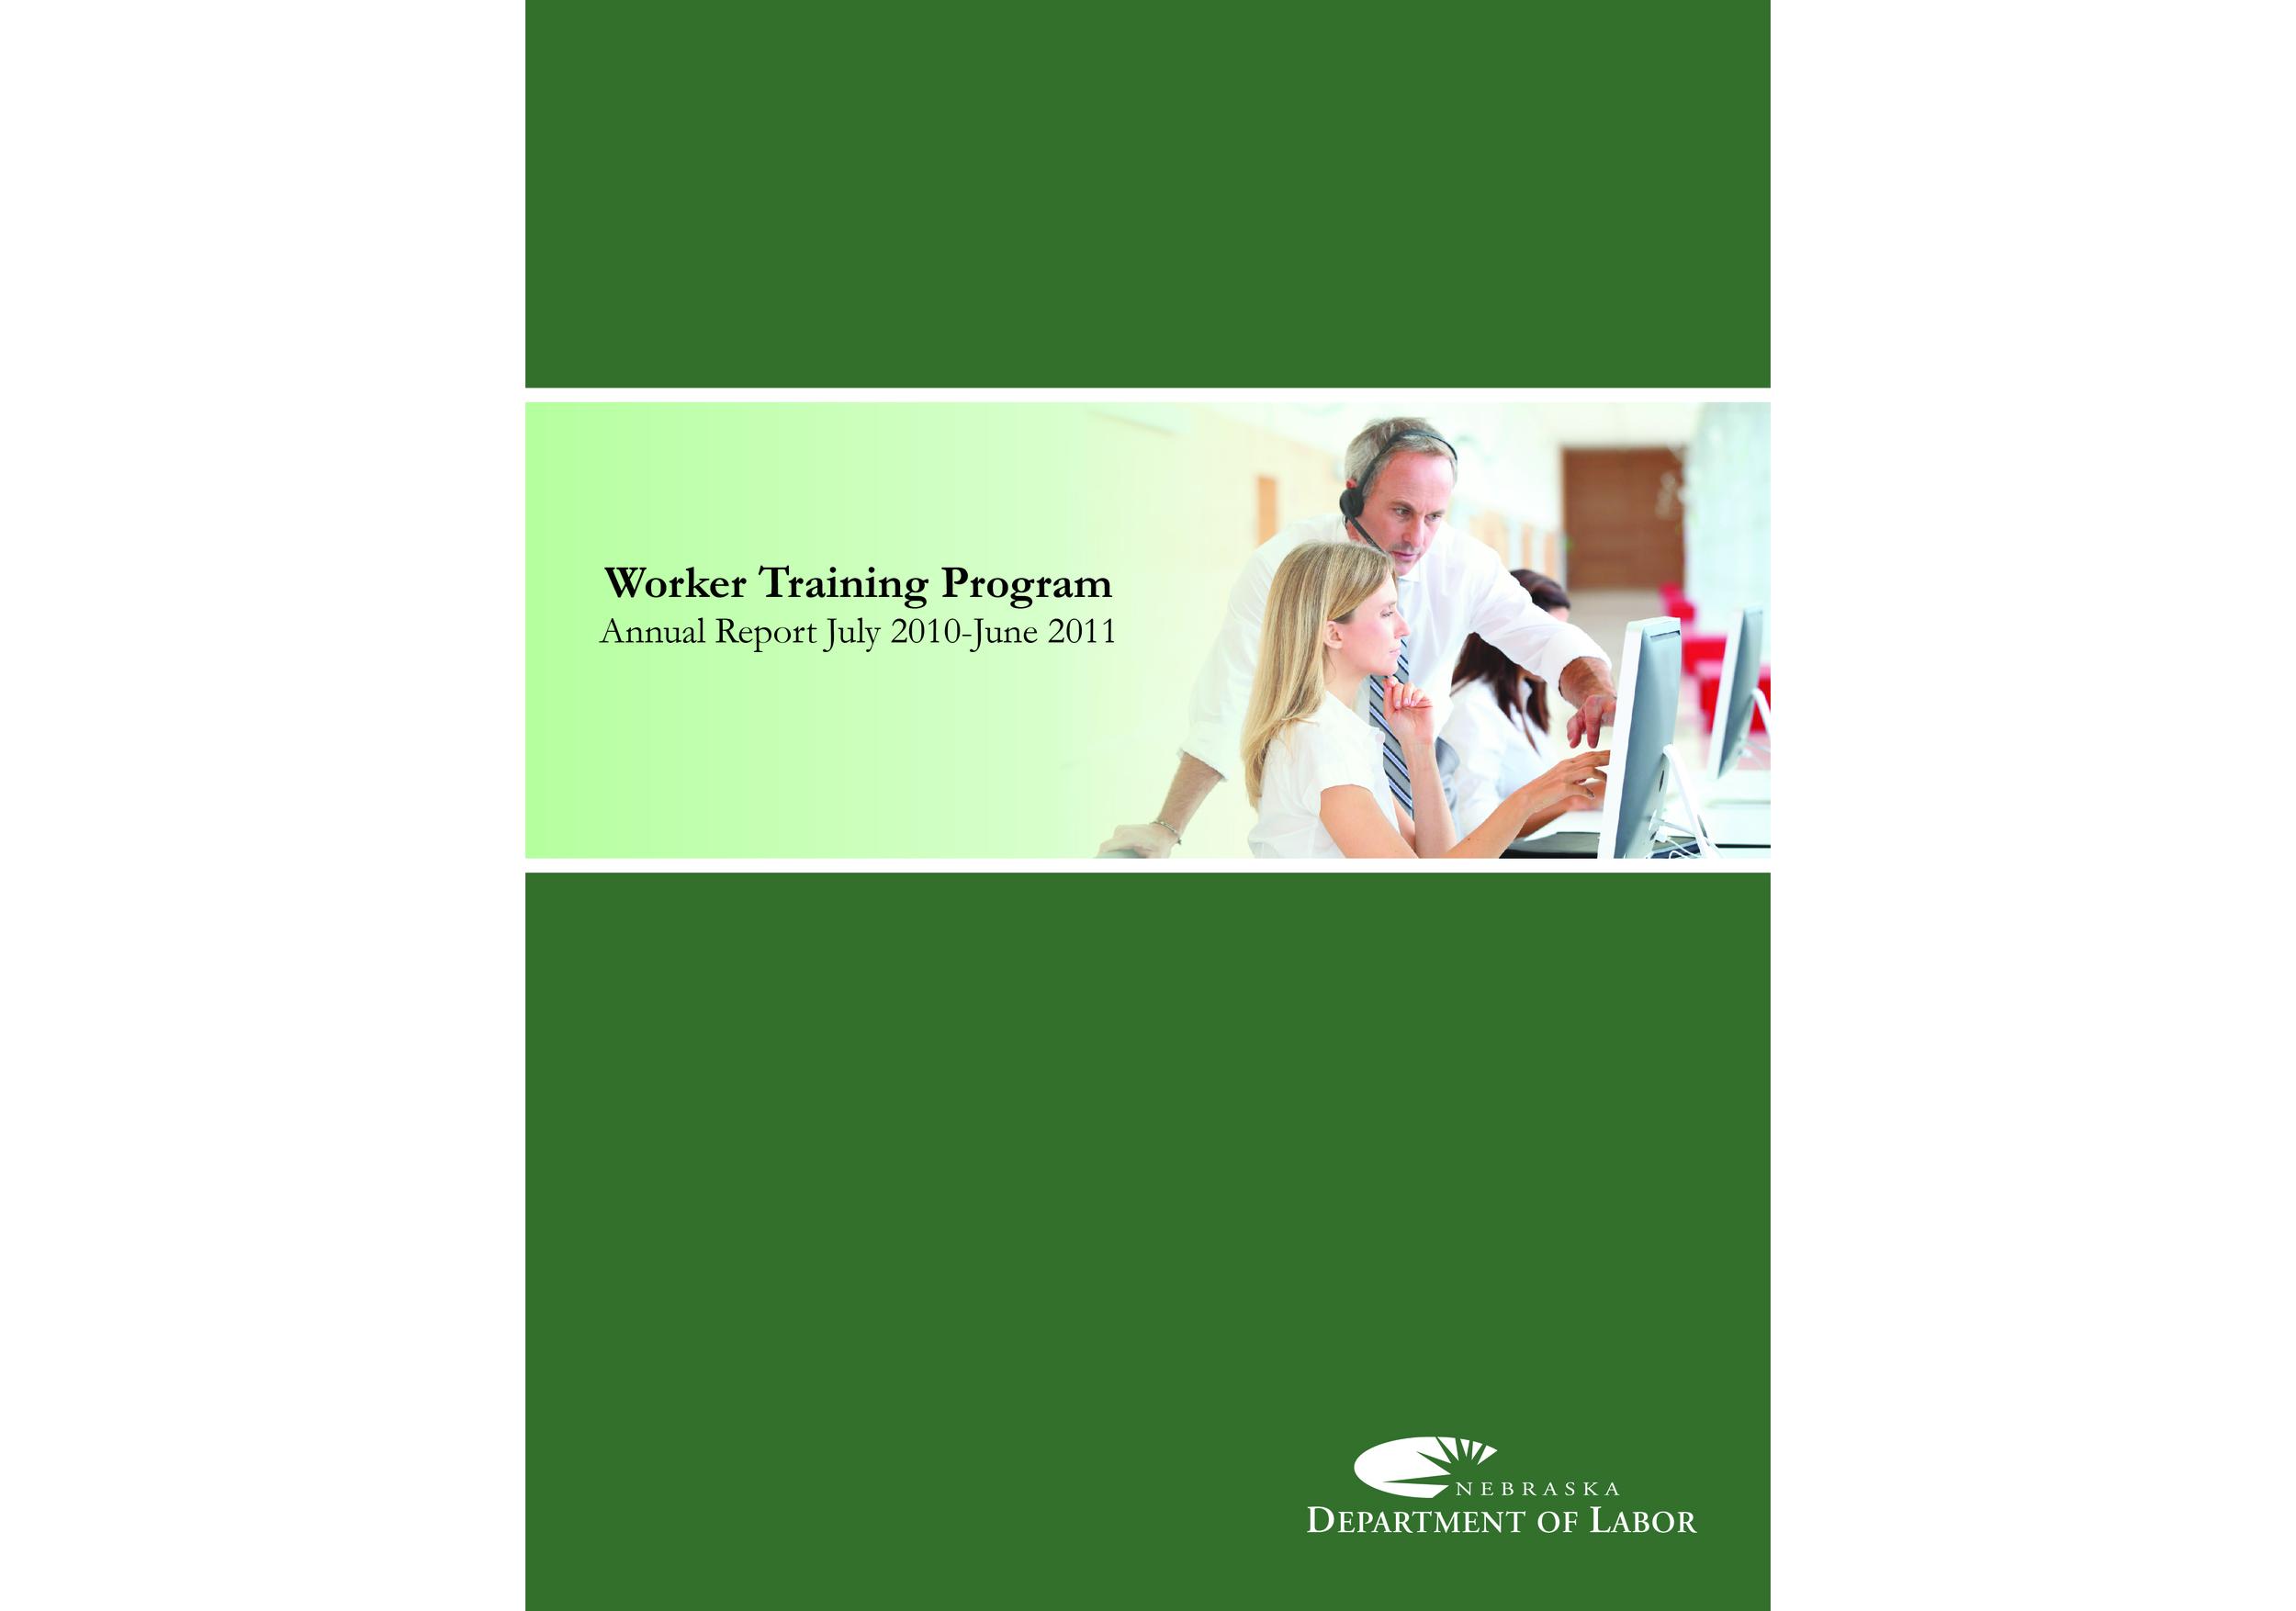 WorkerTrainingProgram10-01.jpg